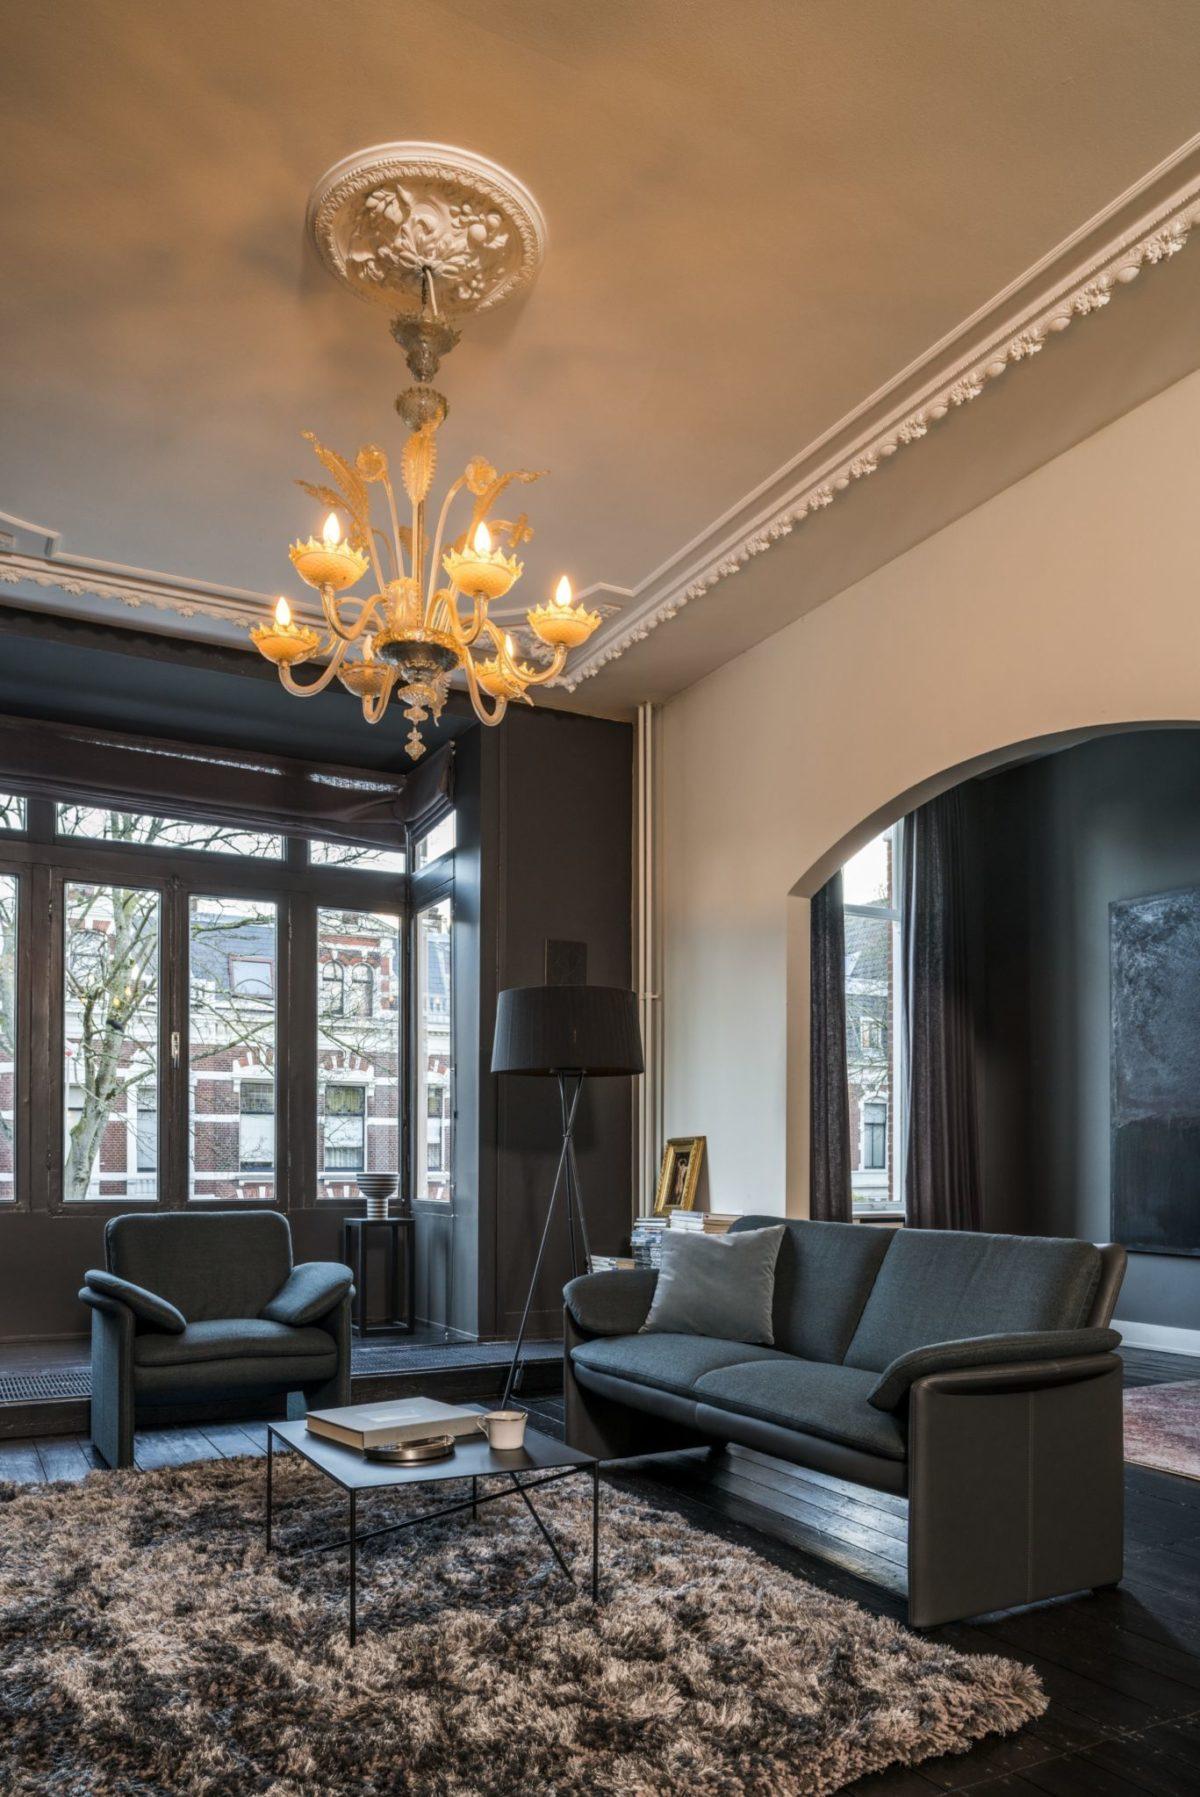 Évidence Catalpa Leolux sofa bankstel 2018 A 098